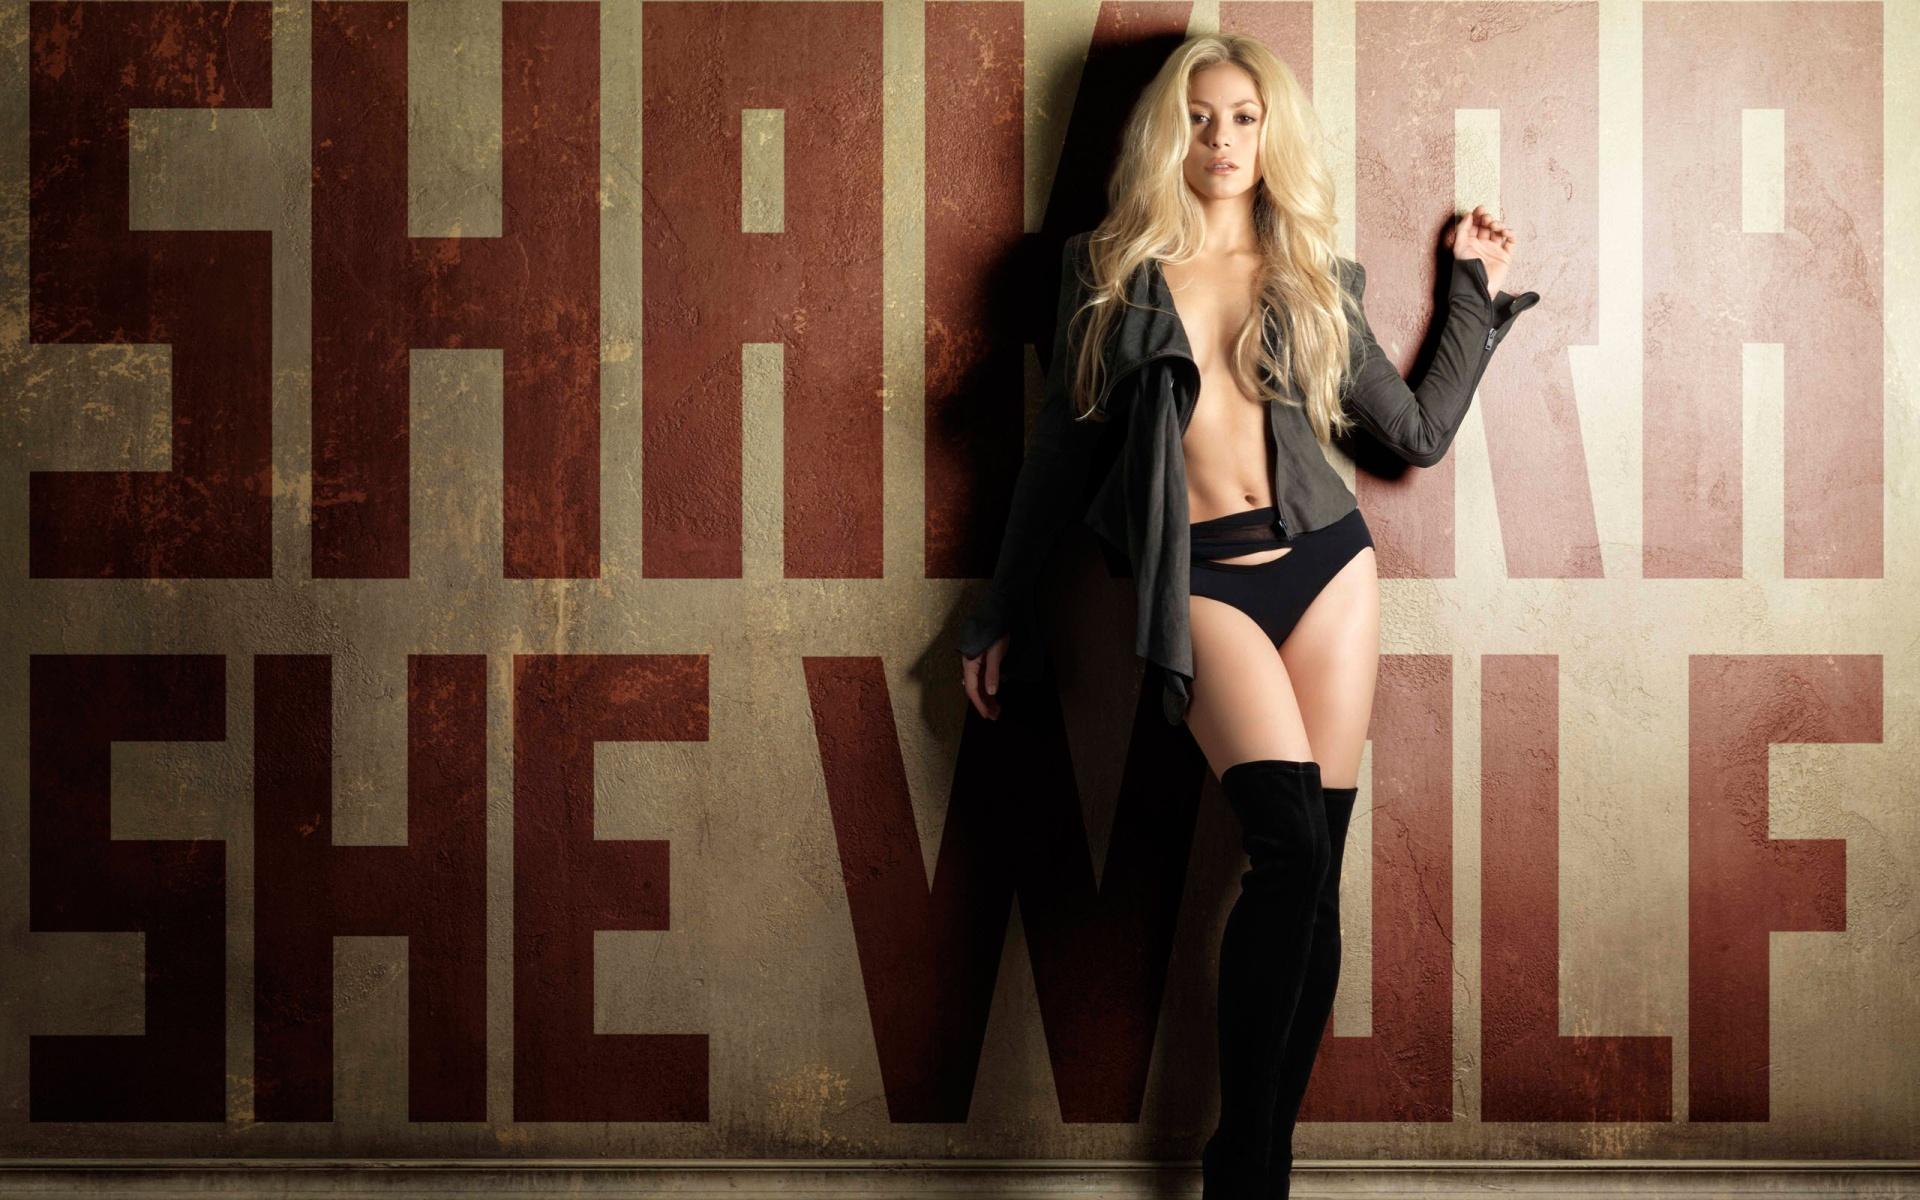 Shakira She Wolf HD wallpaper HD Wallpapers 1920x1200